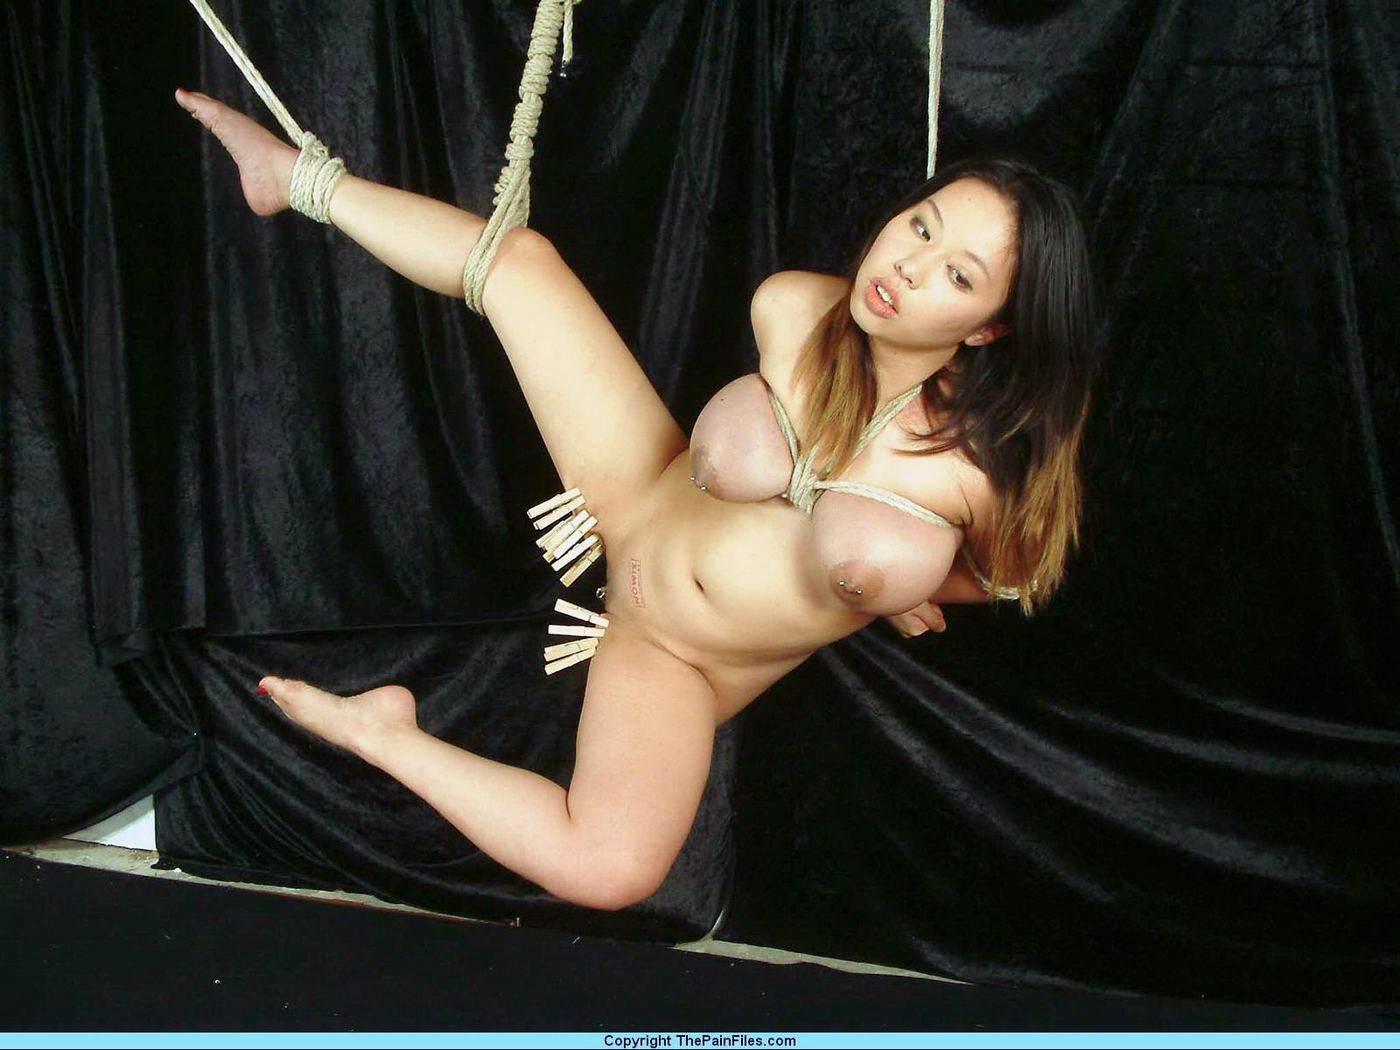 Hanged women sex sexy pics